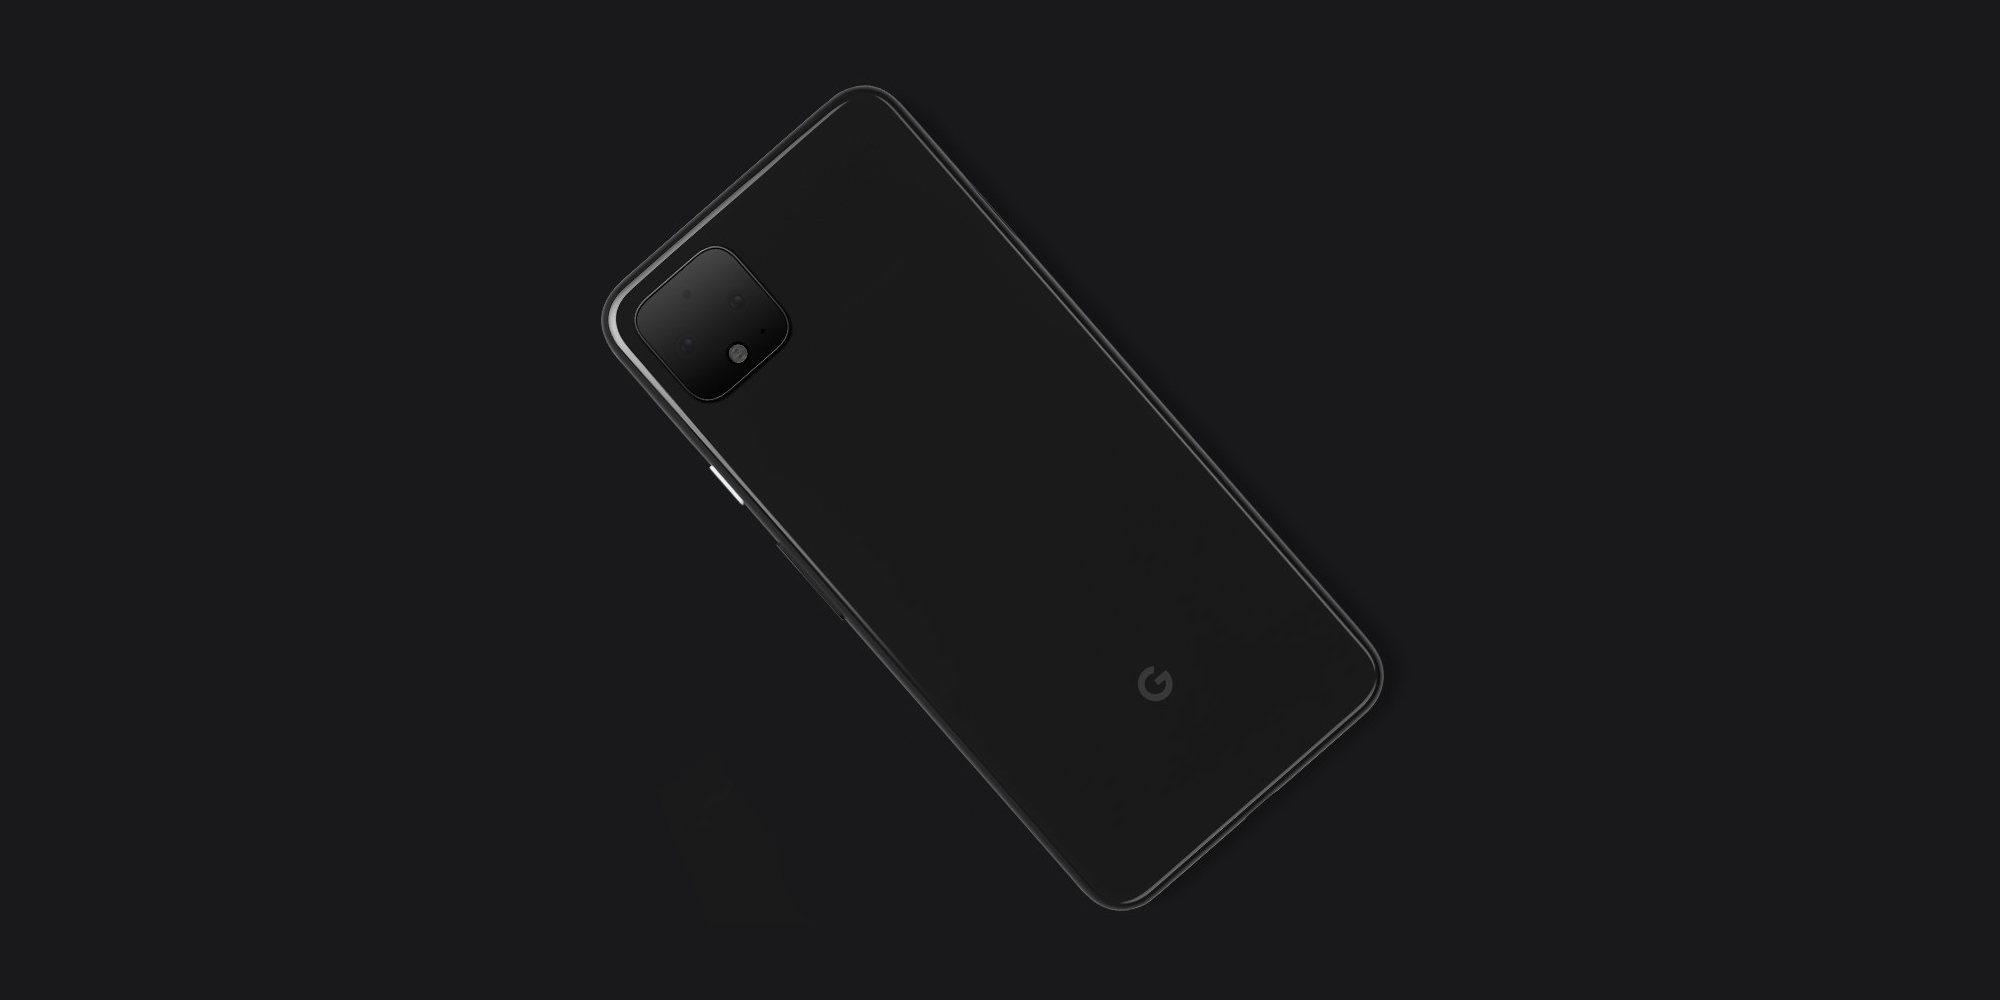 Google Pixel 4 design